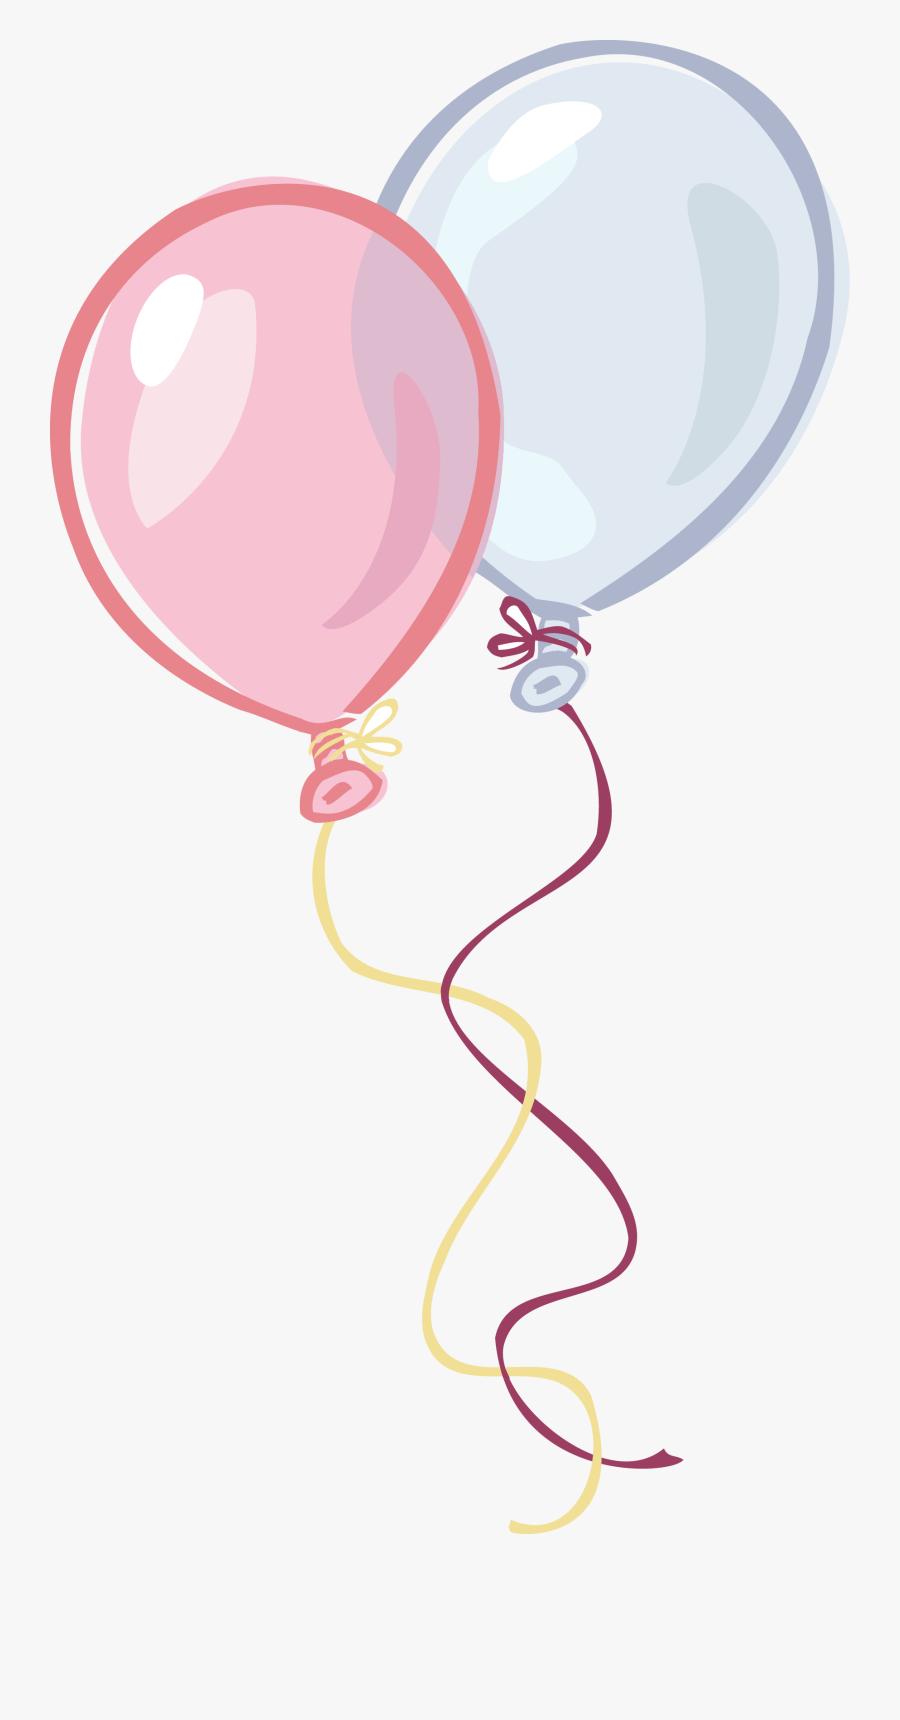 Transparent Birthday Balloons Clip Art - Birthday Balloon Pink Png, Transparent Clipart